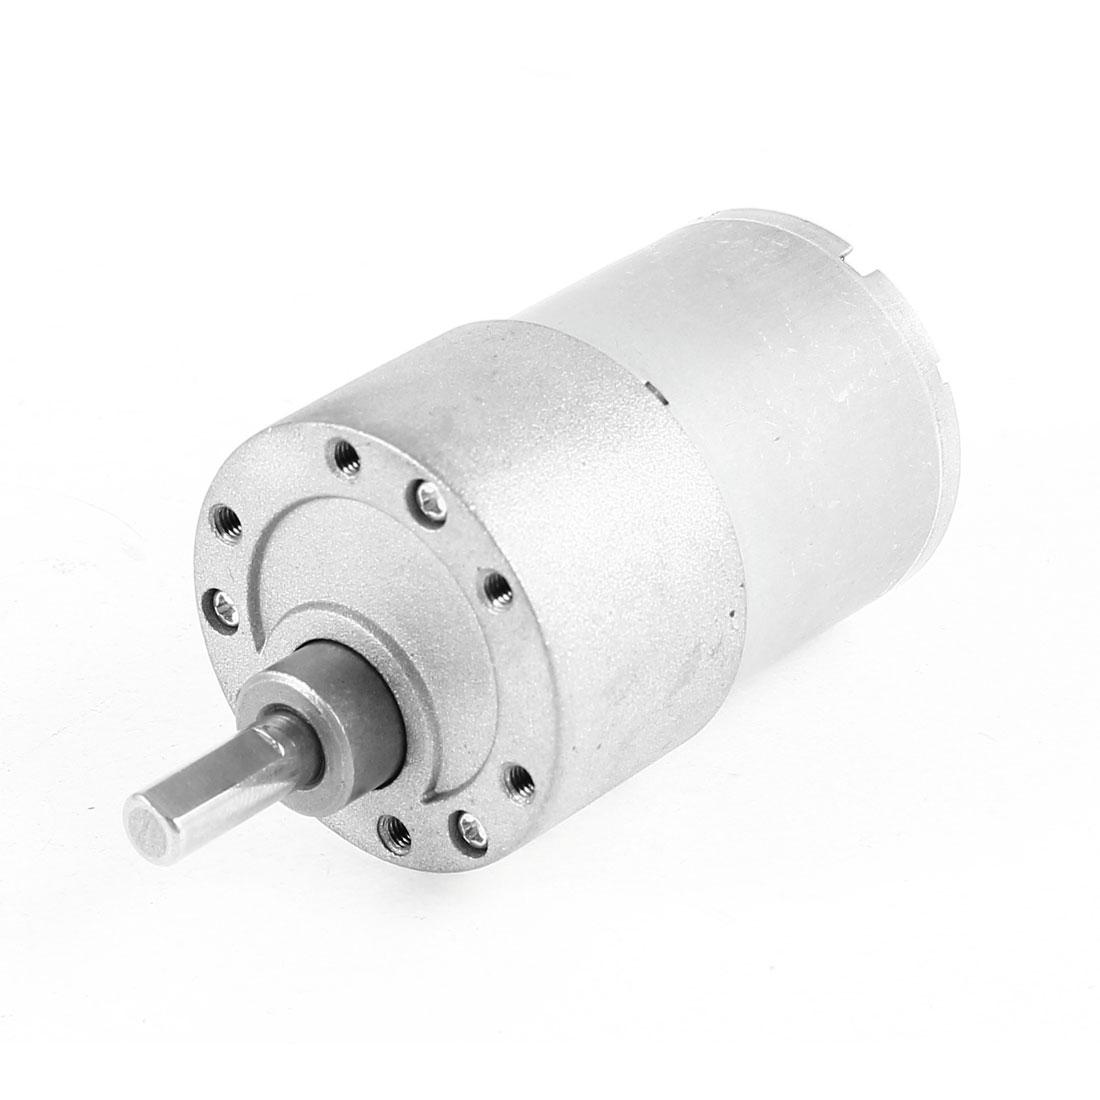 DC 24V 319RPM 5.9mm Shaft Electric Gear Box Speed Reduce Micro Motor